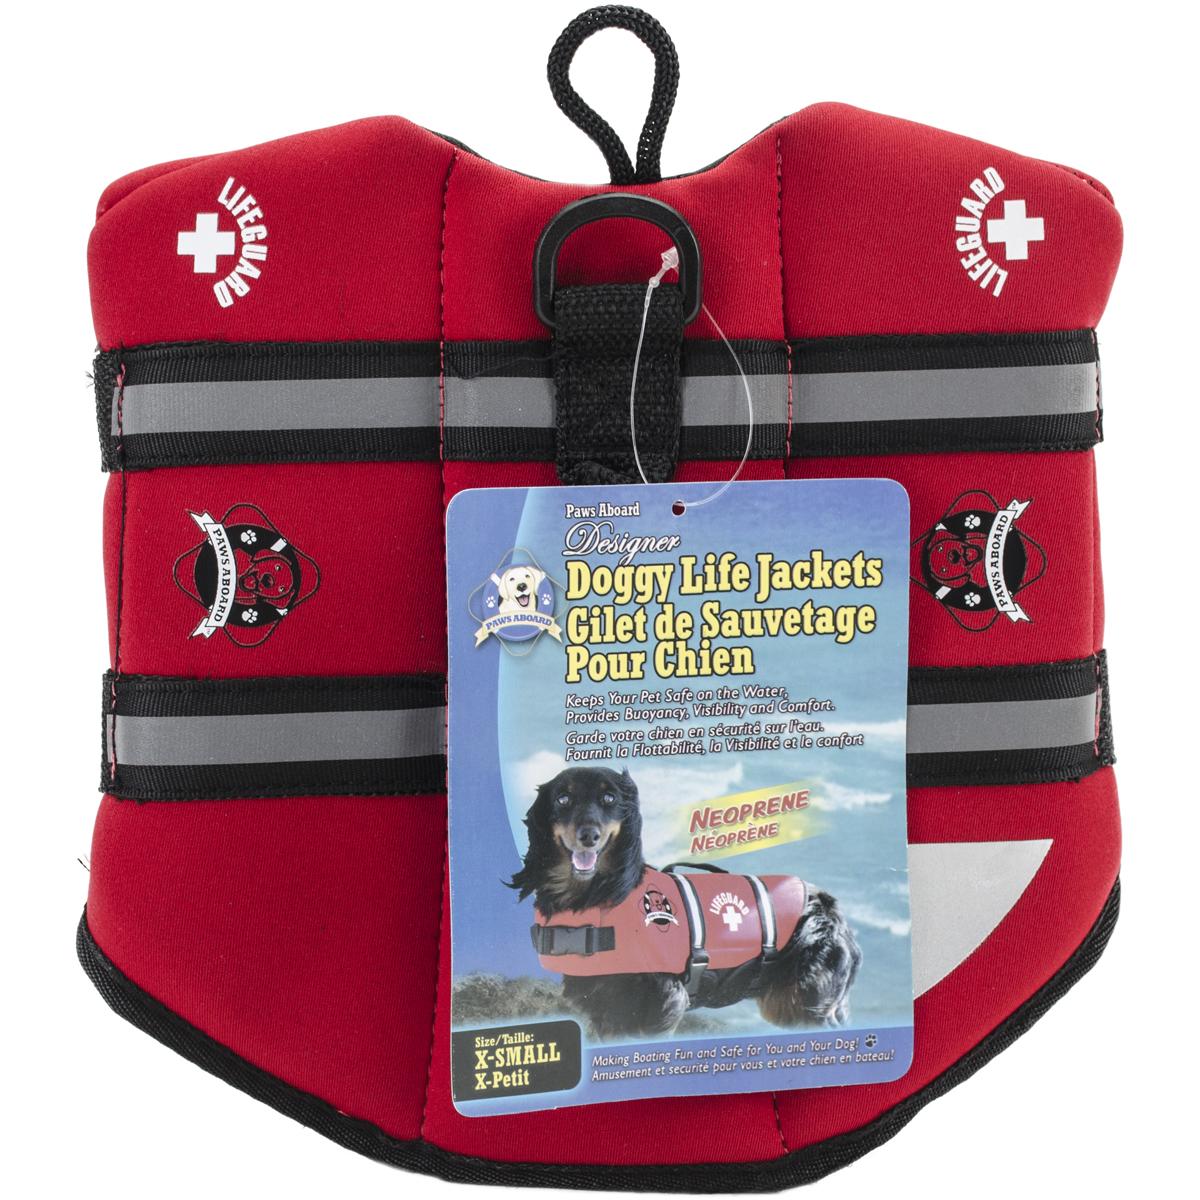 Paws Aboard Lifeguard Neoprene Doggy Life Jacket